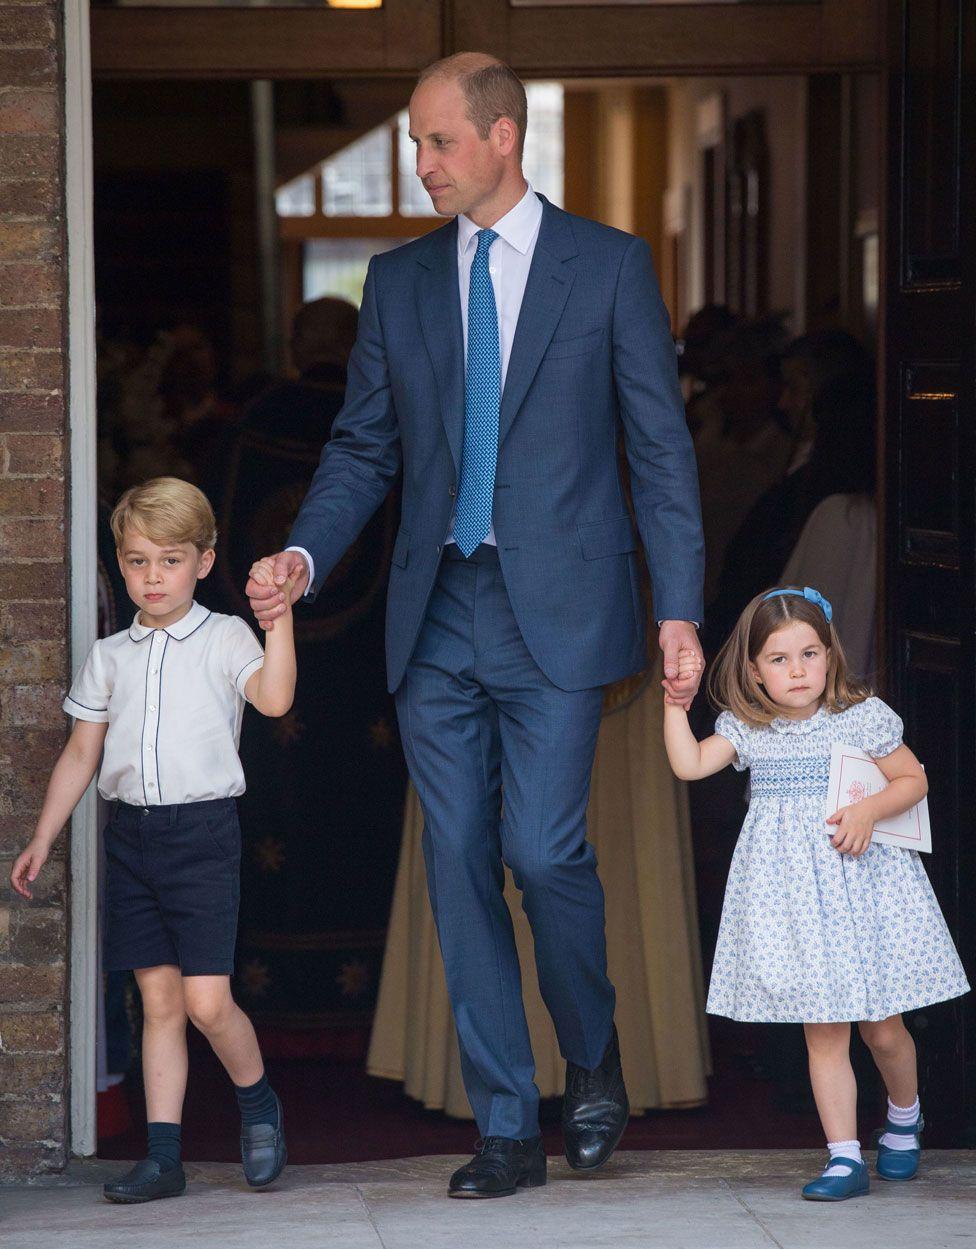 Prince George, Prince William and Princess Charlotte